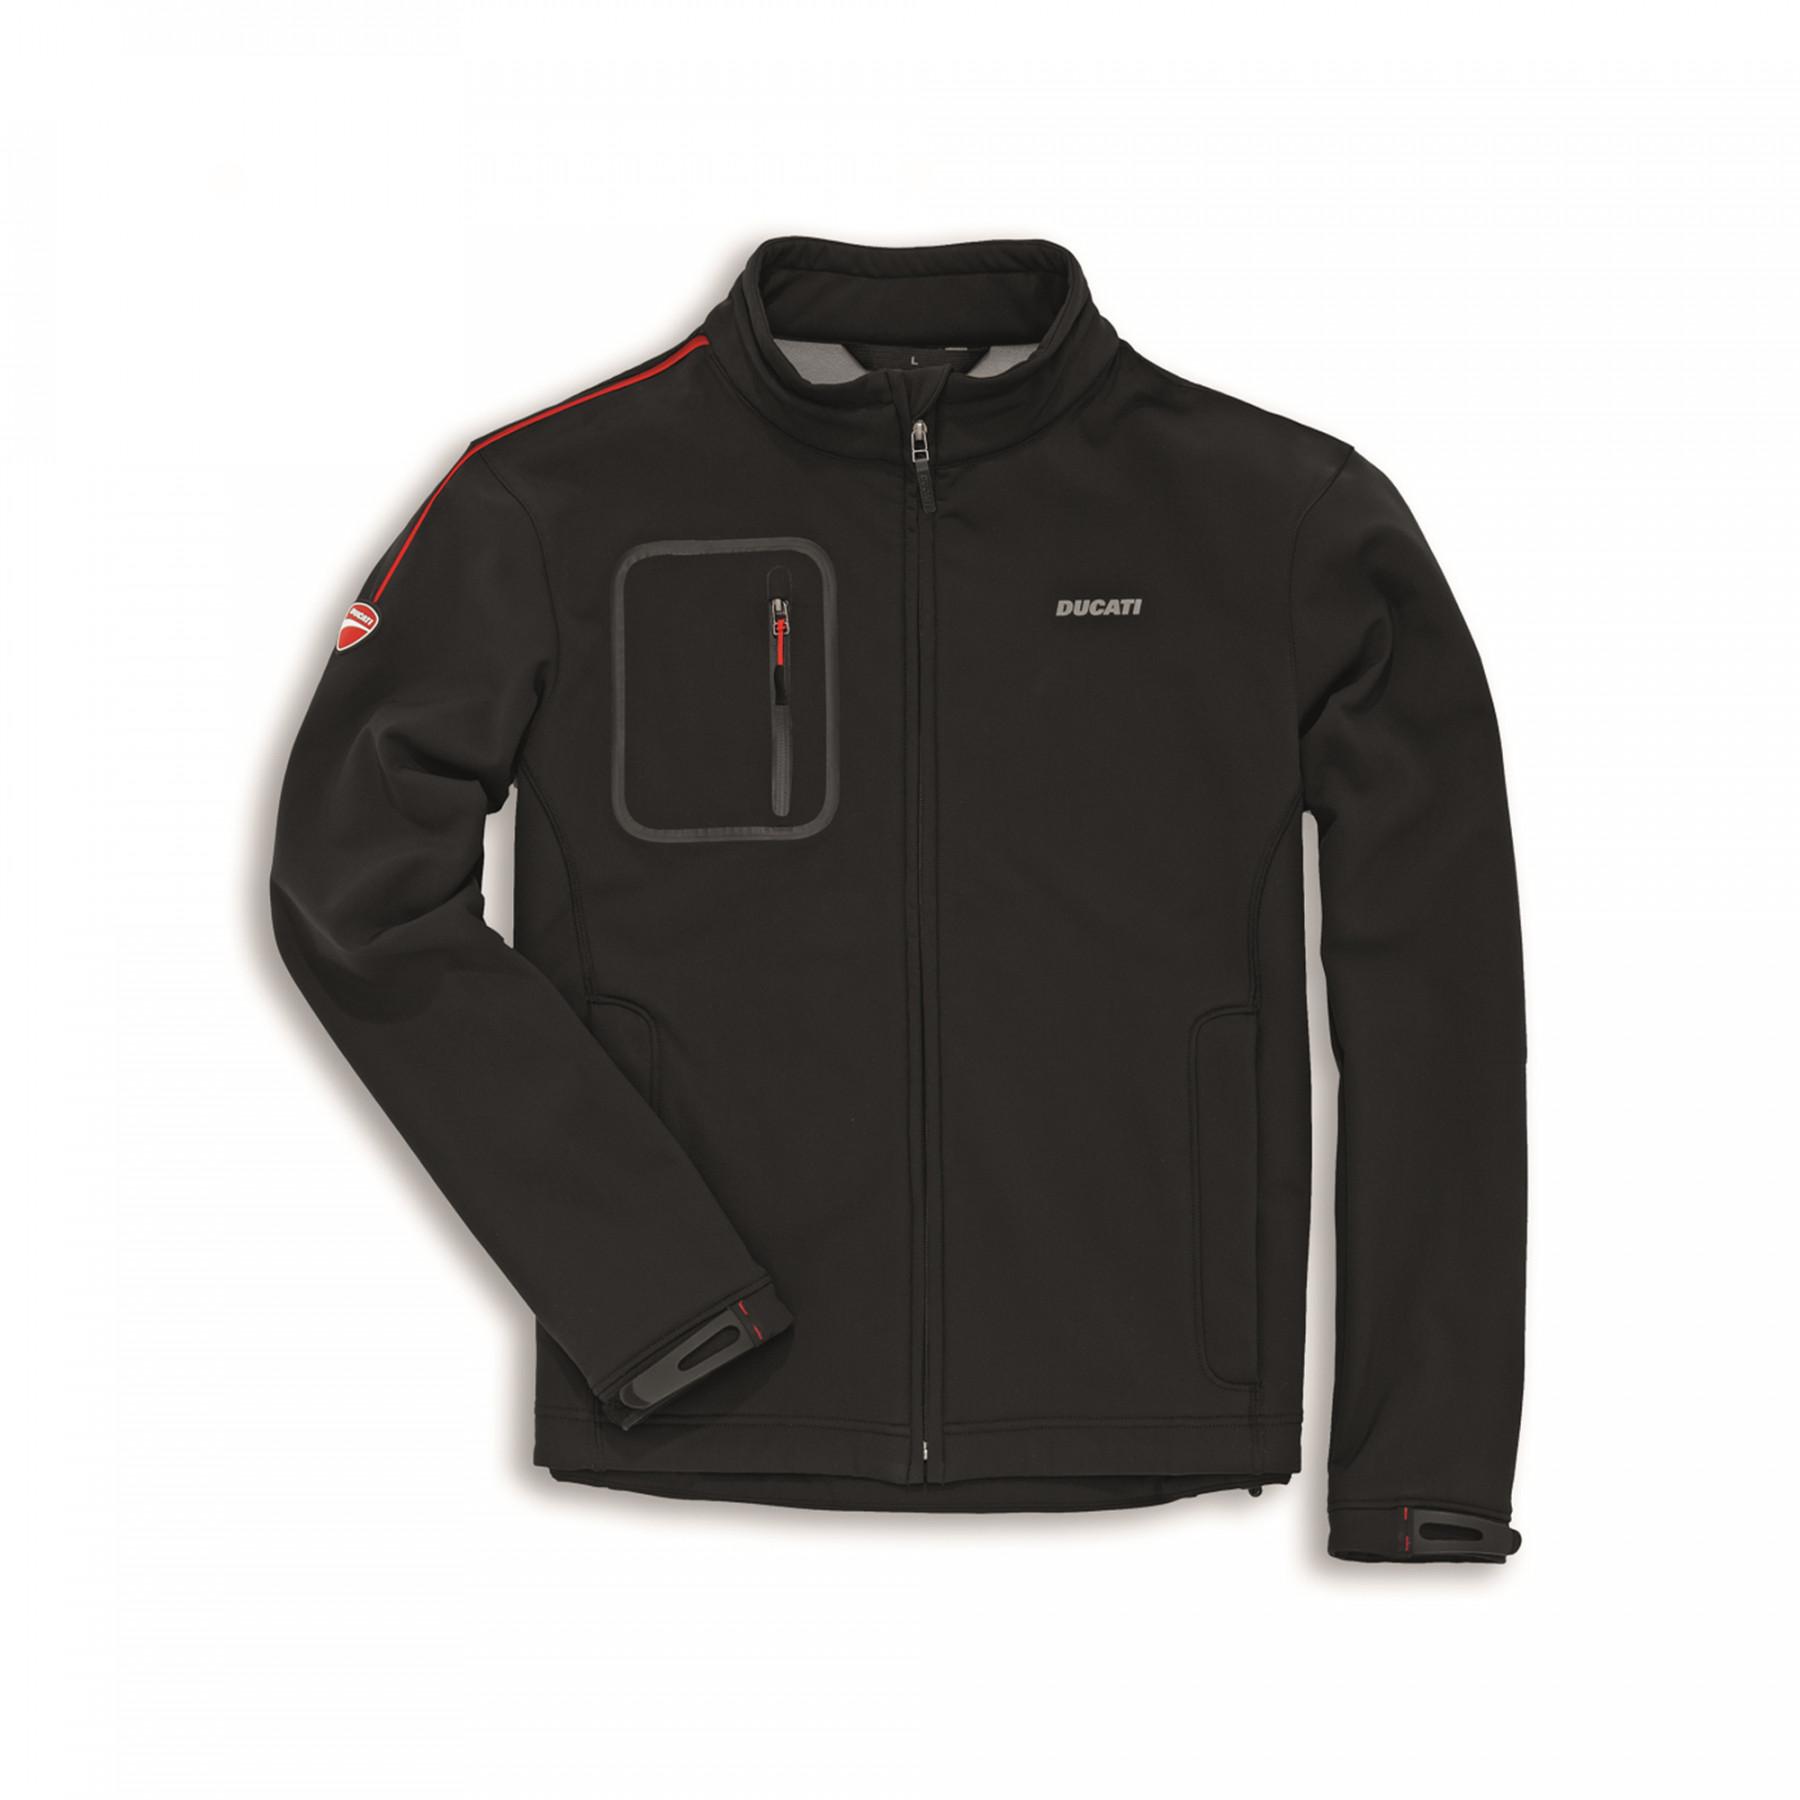 Ducati jas windproof € 178,00